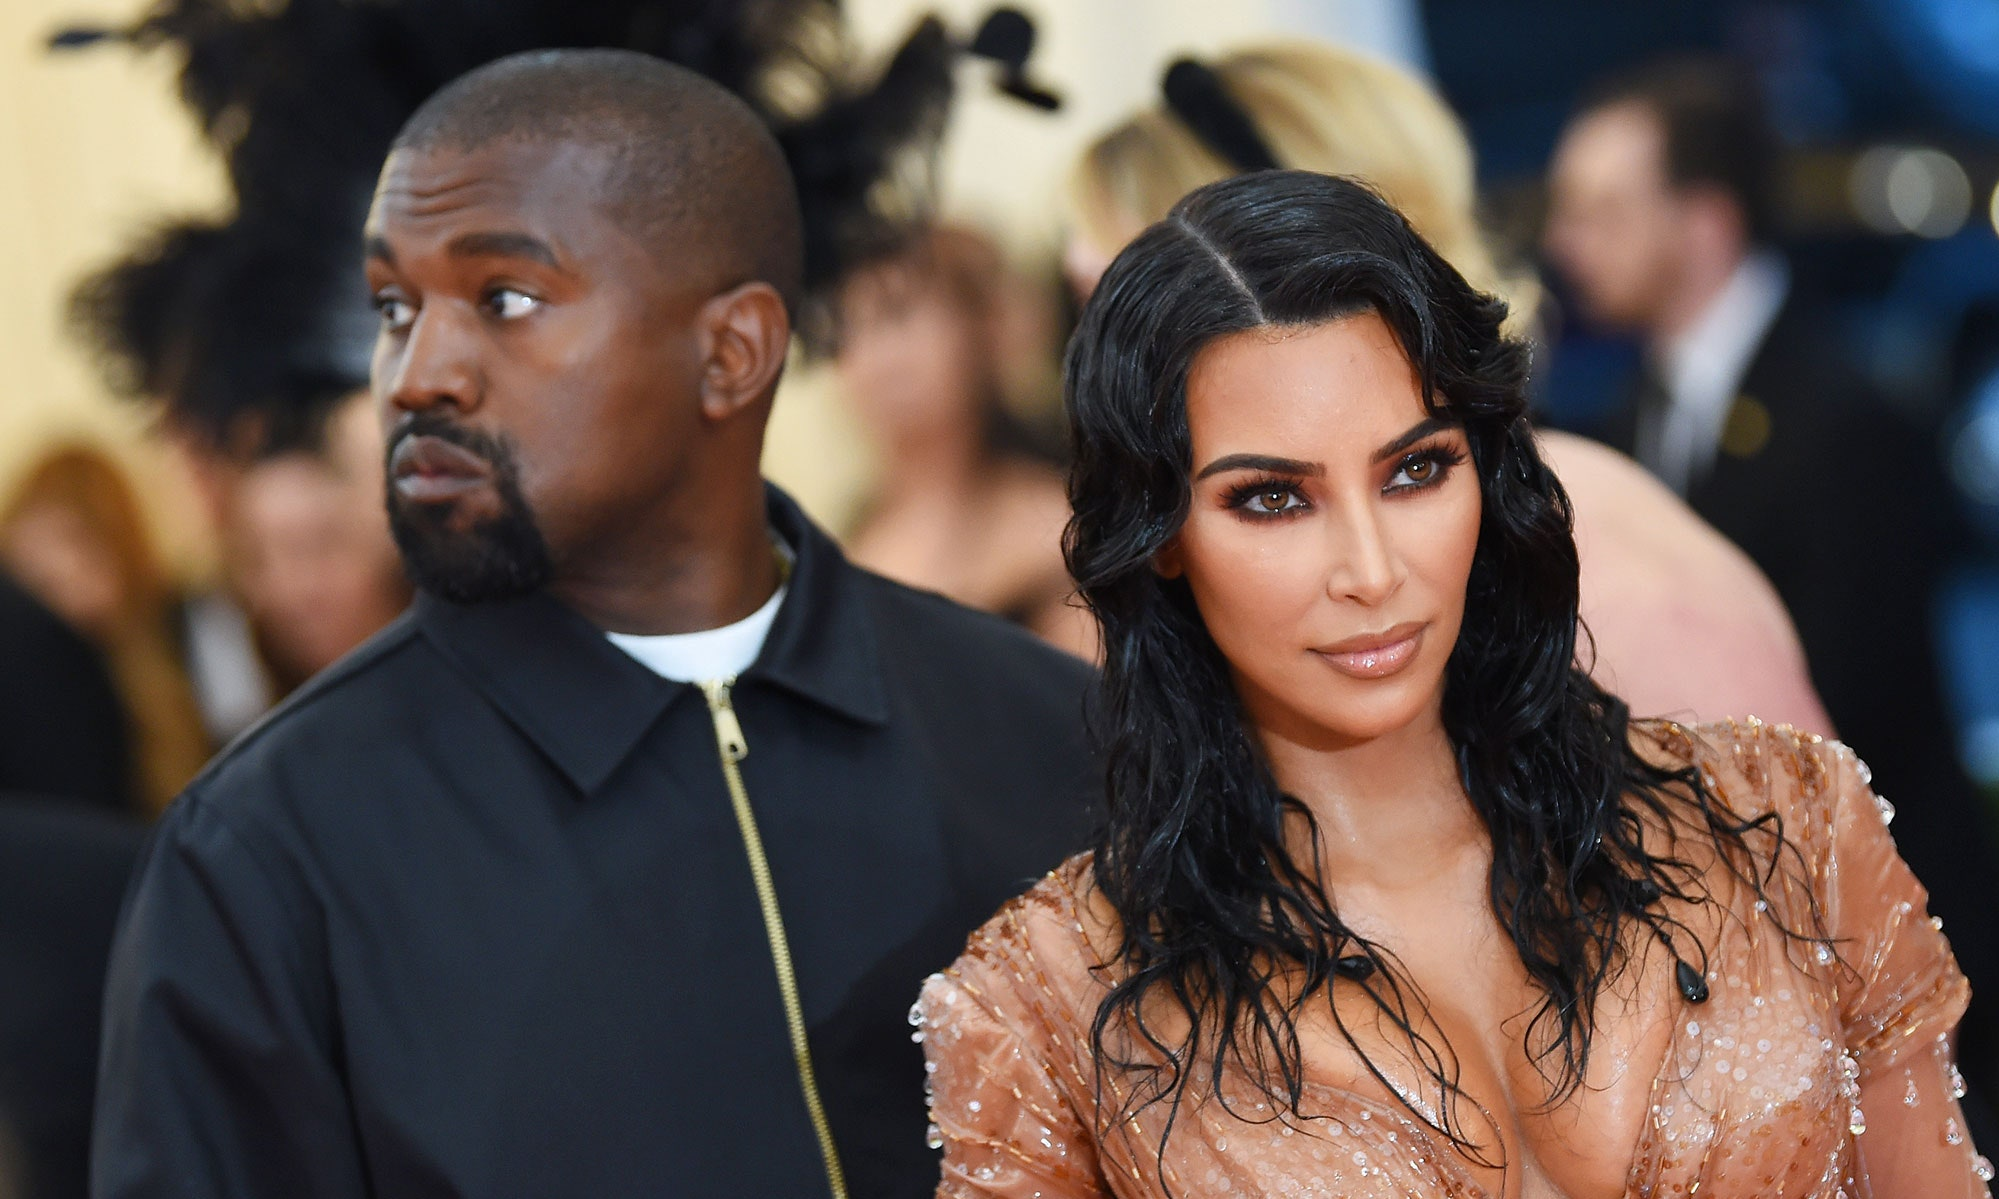 Kim Kardashian defends Kanye West amid bipolar disorder Twitter rants